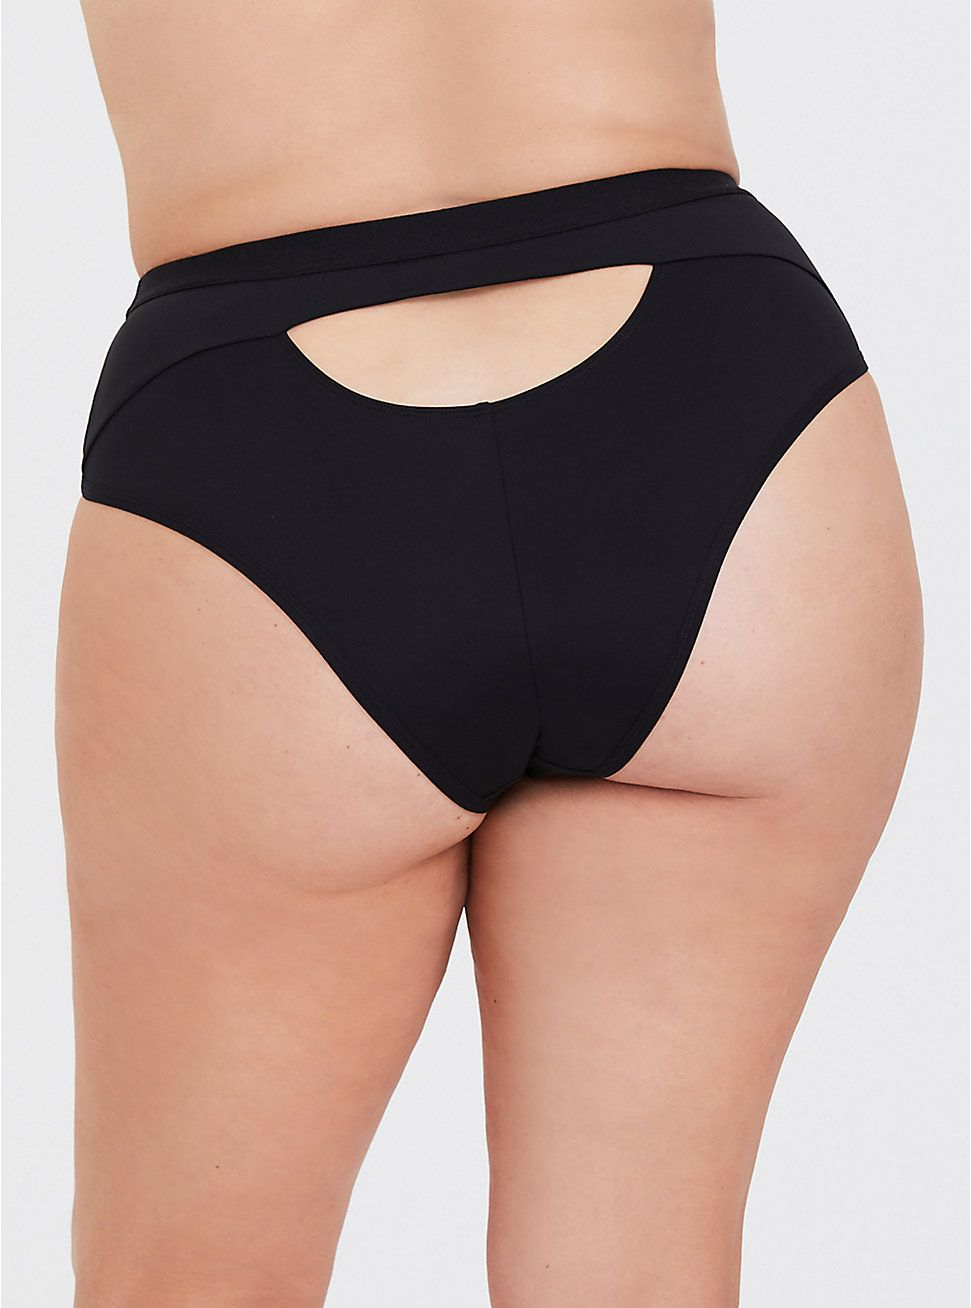 b3a2aab0e Microfiber High Waist High-Leg Panty in Black in 2019